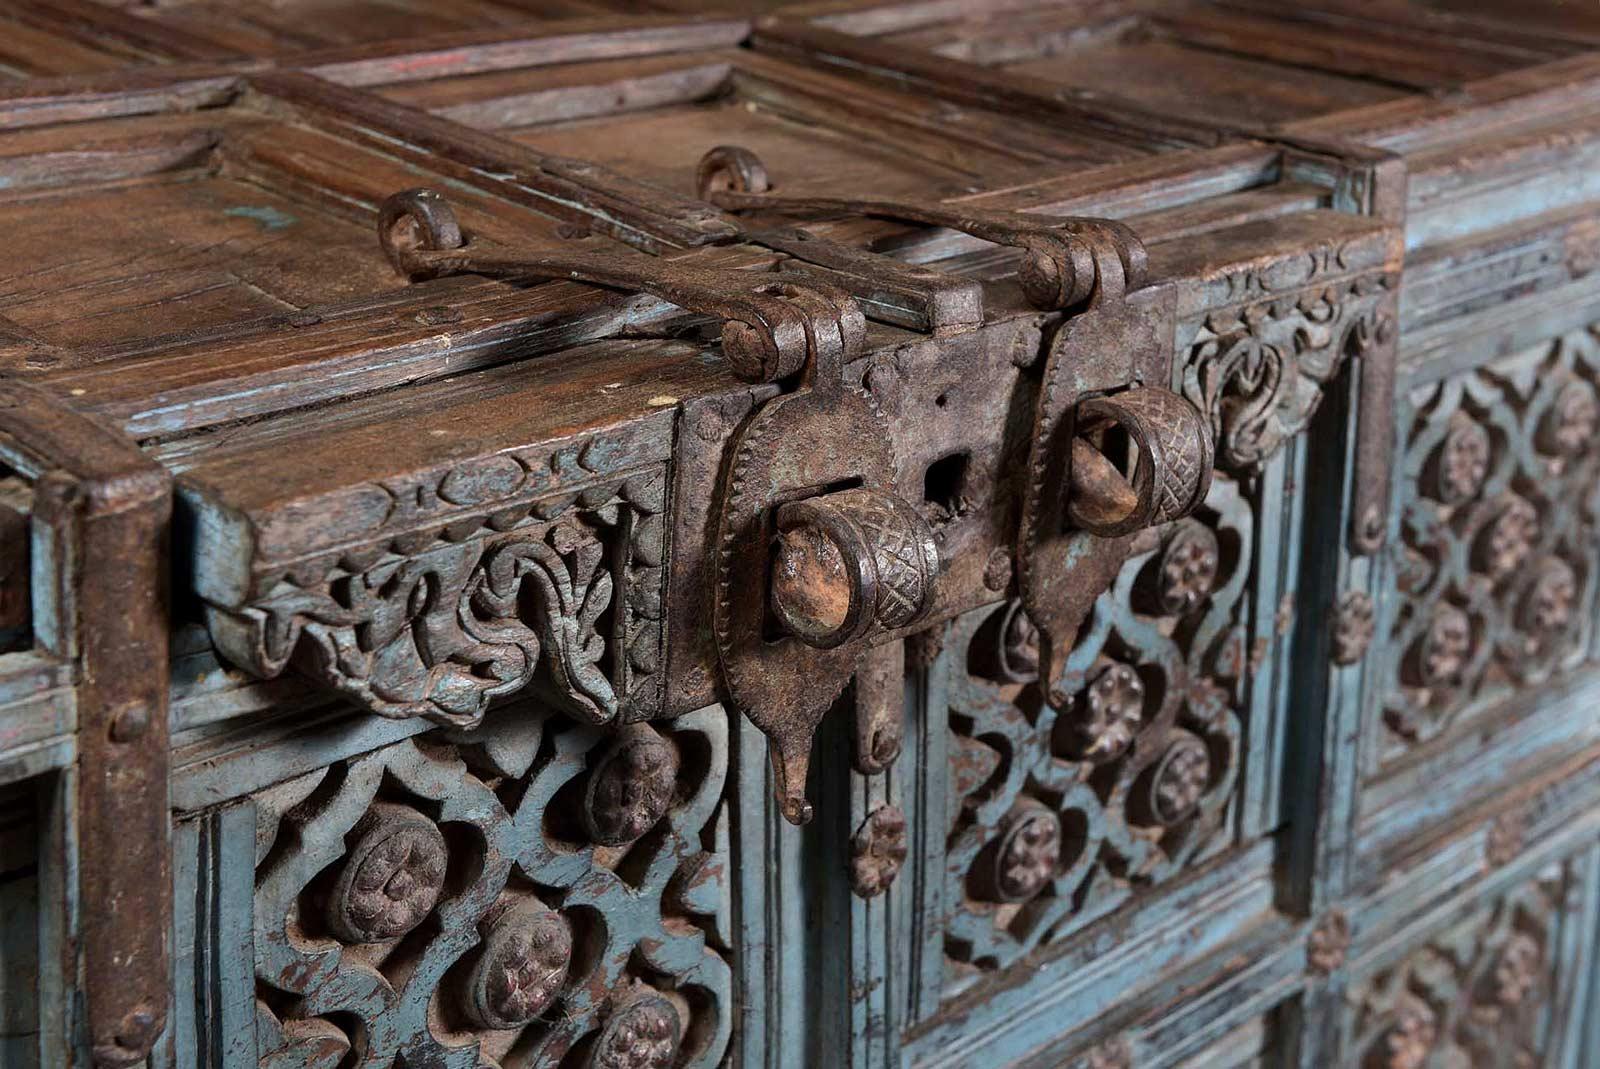 oude-damchiya-kast-uit-india-oosterse-meubelen-indiase-meubels-koreman-maastricht